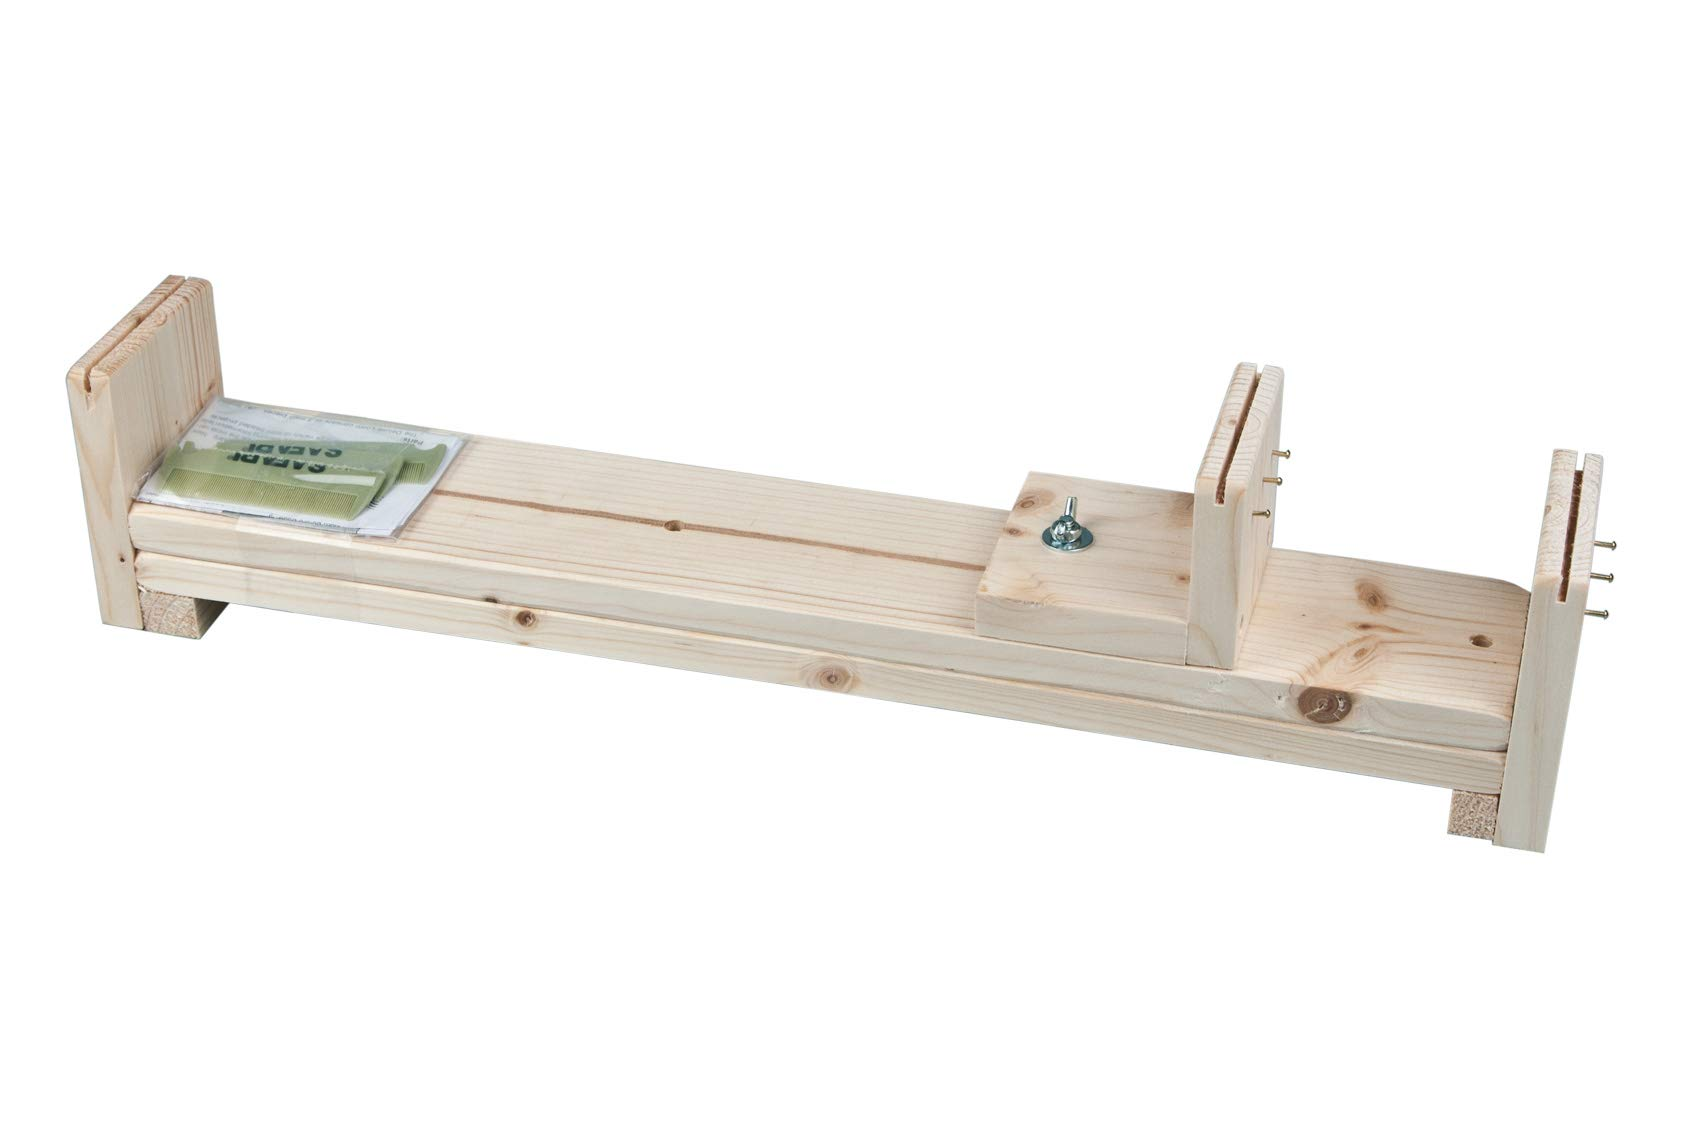 Deluxe Adjustable Bead Loom by Missouri River